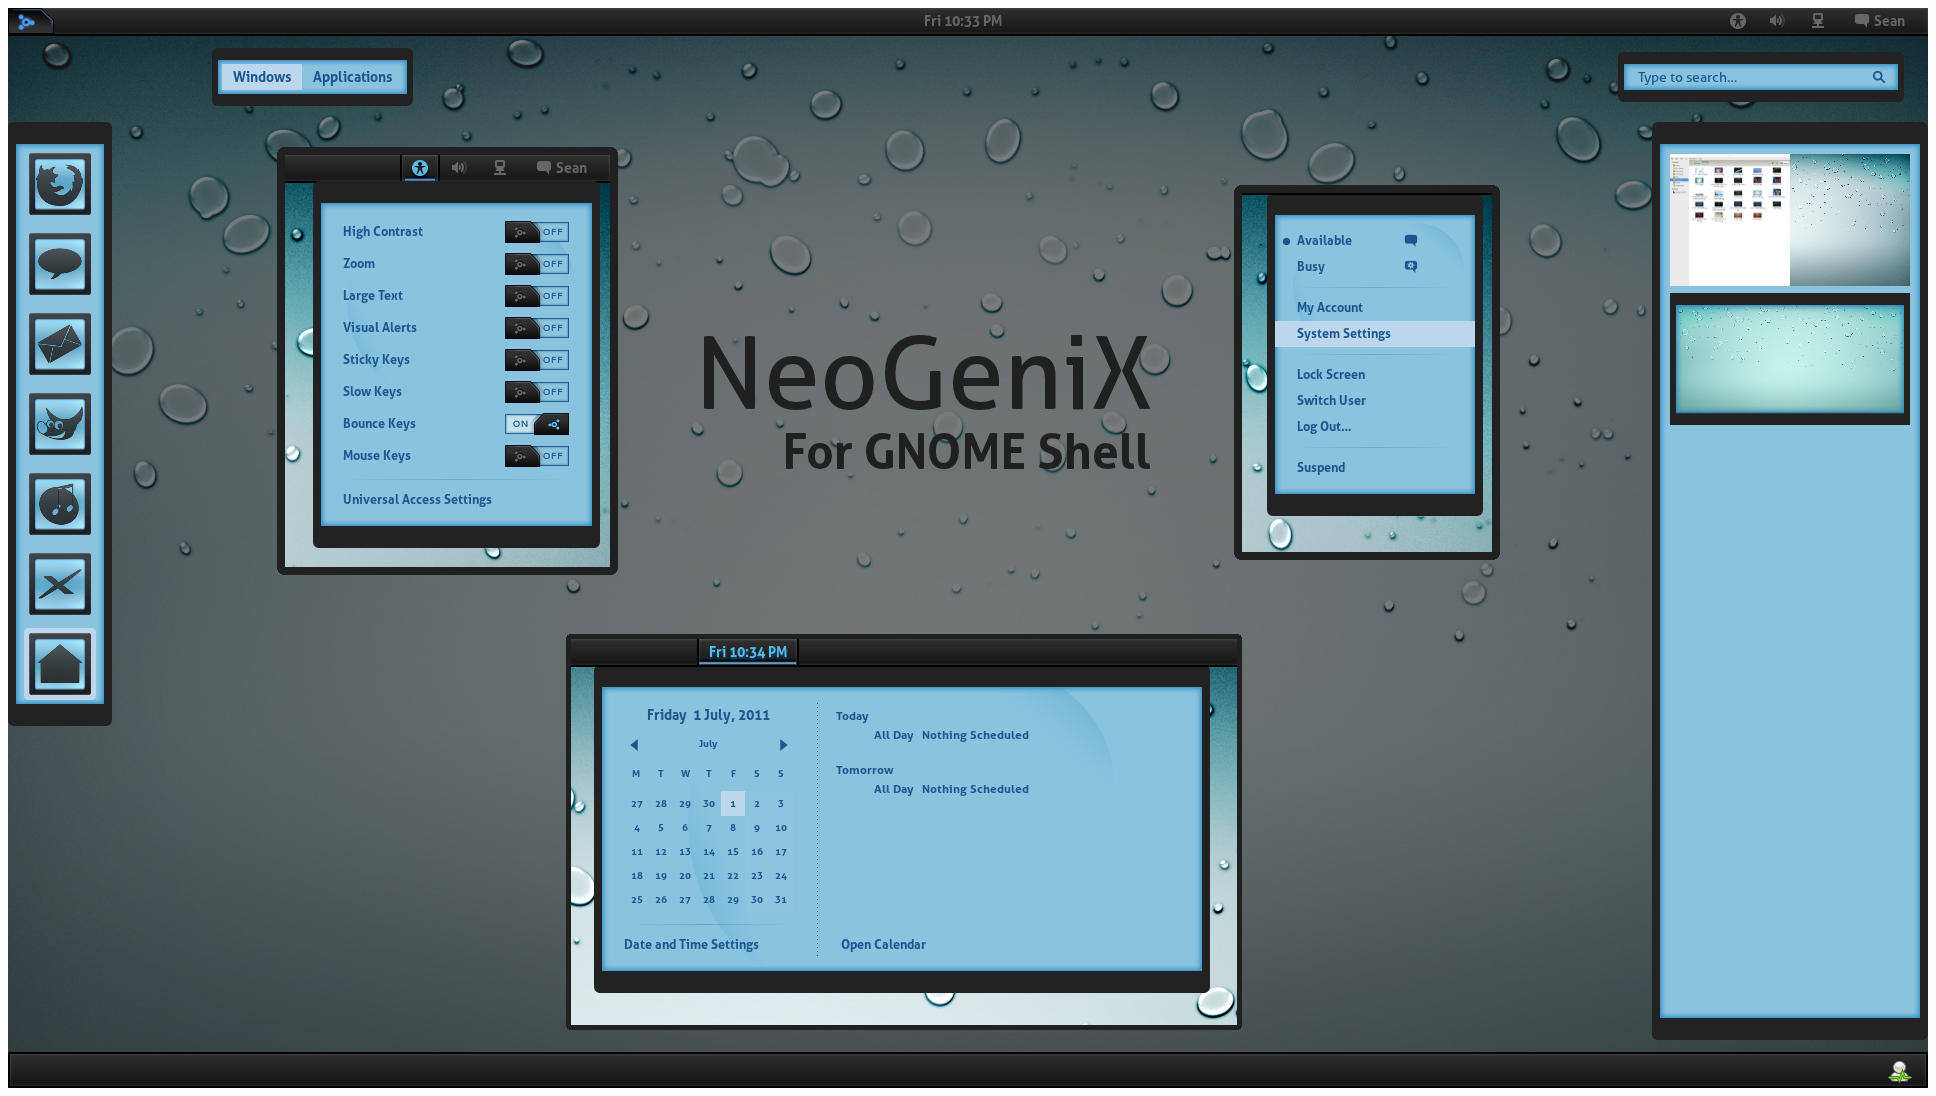 GNOME Shell - NeoGeniX by half-left